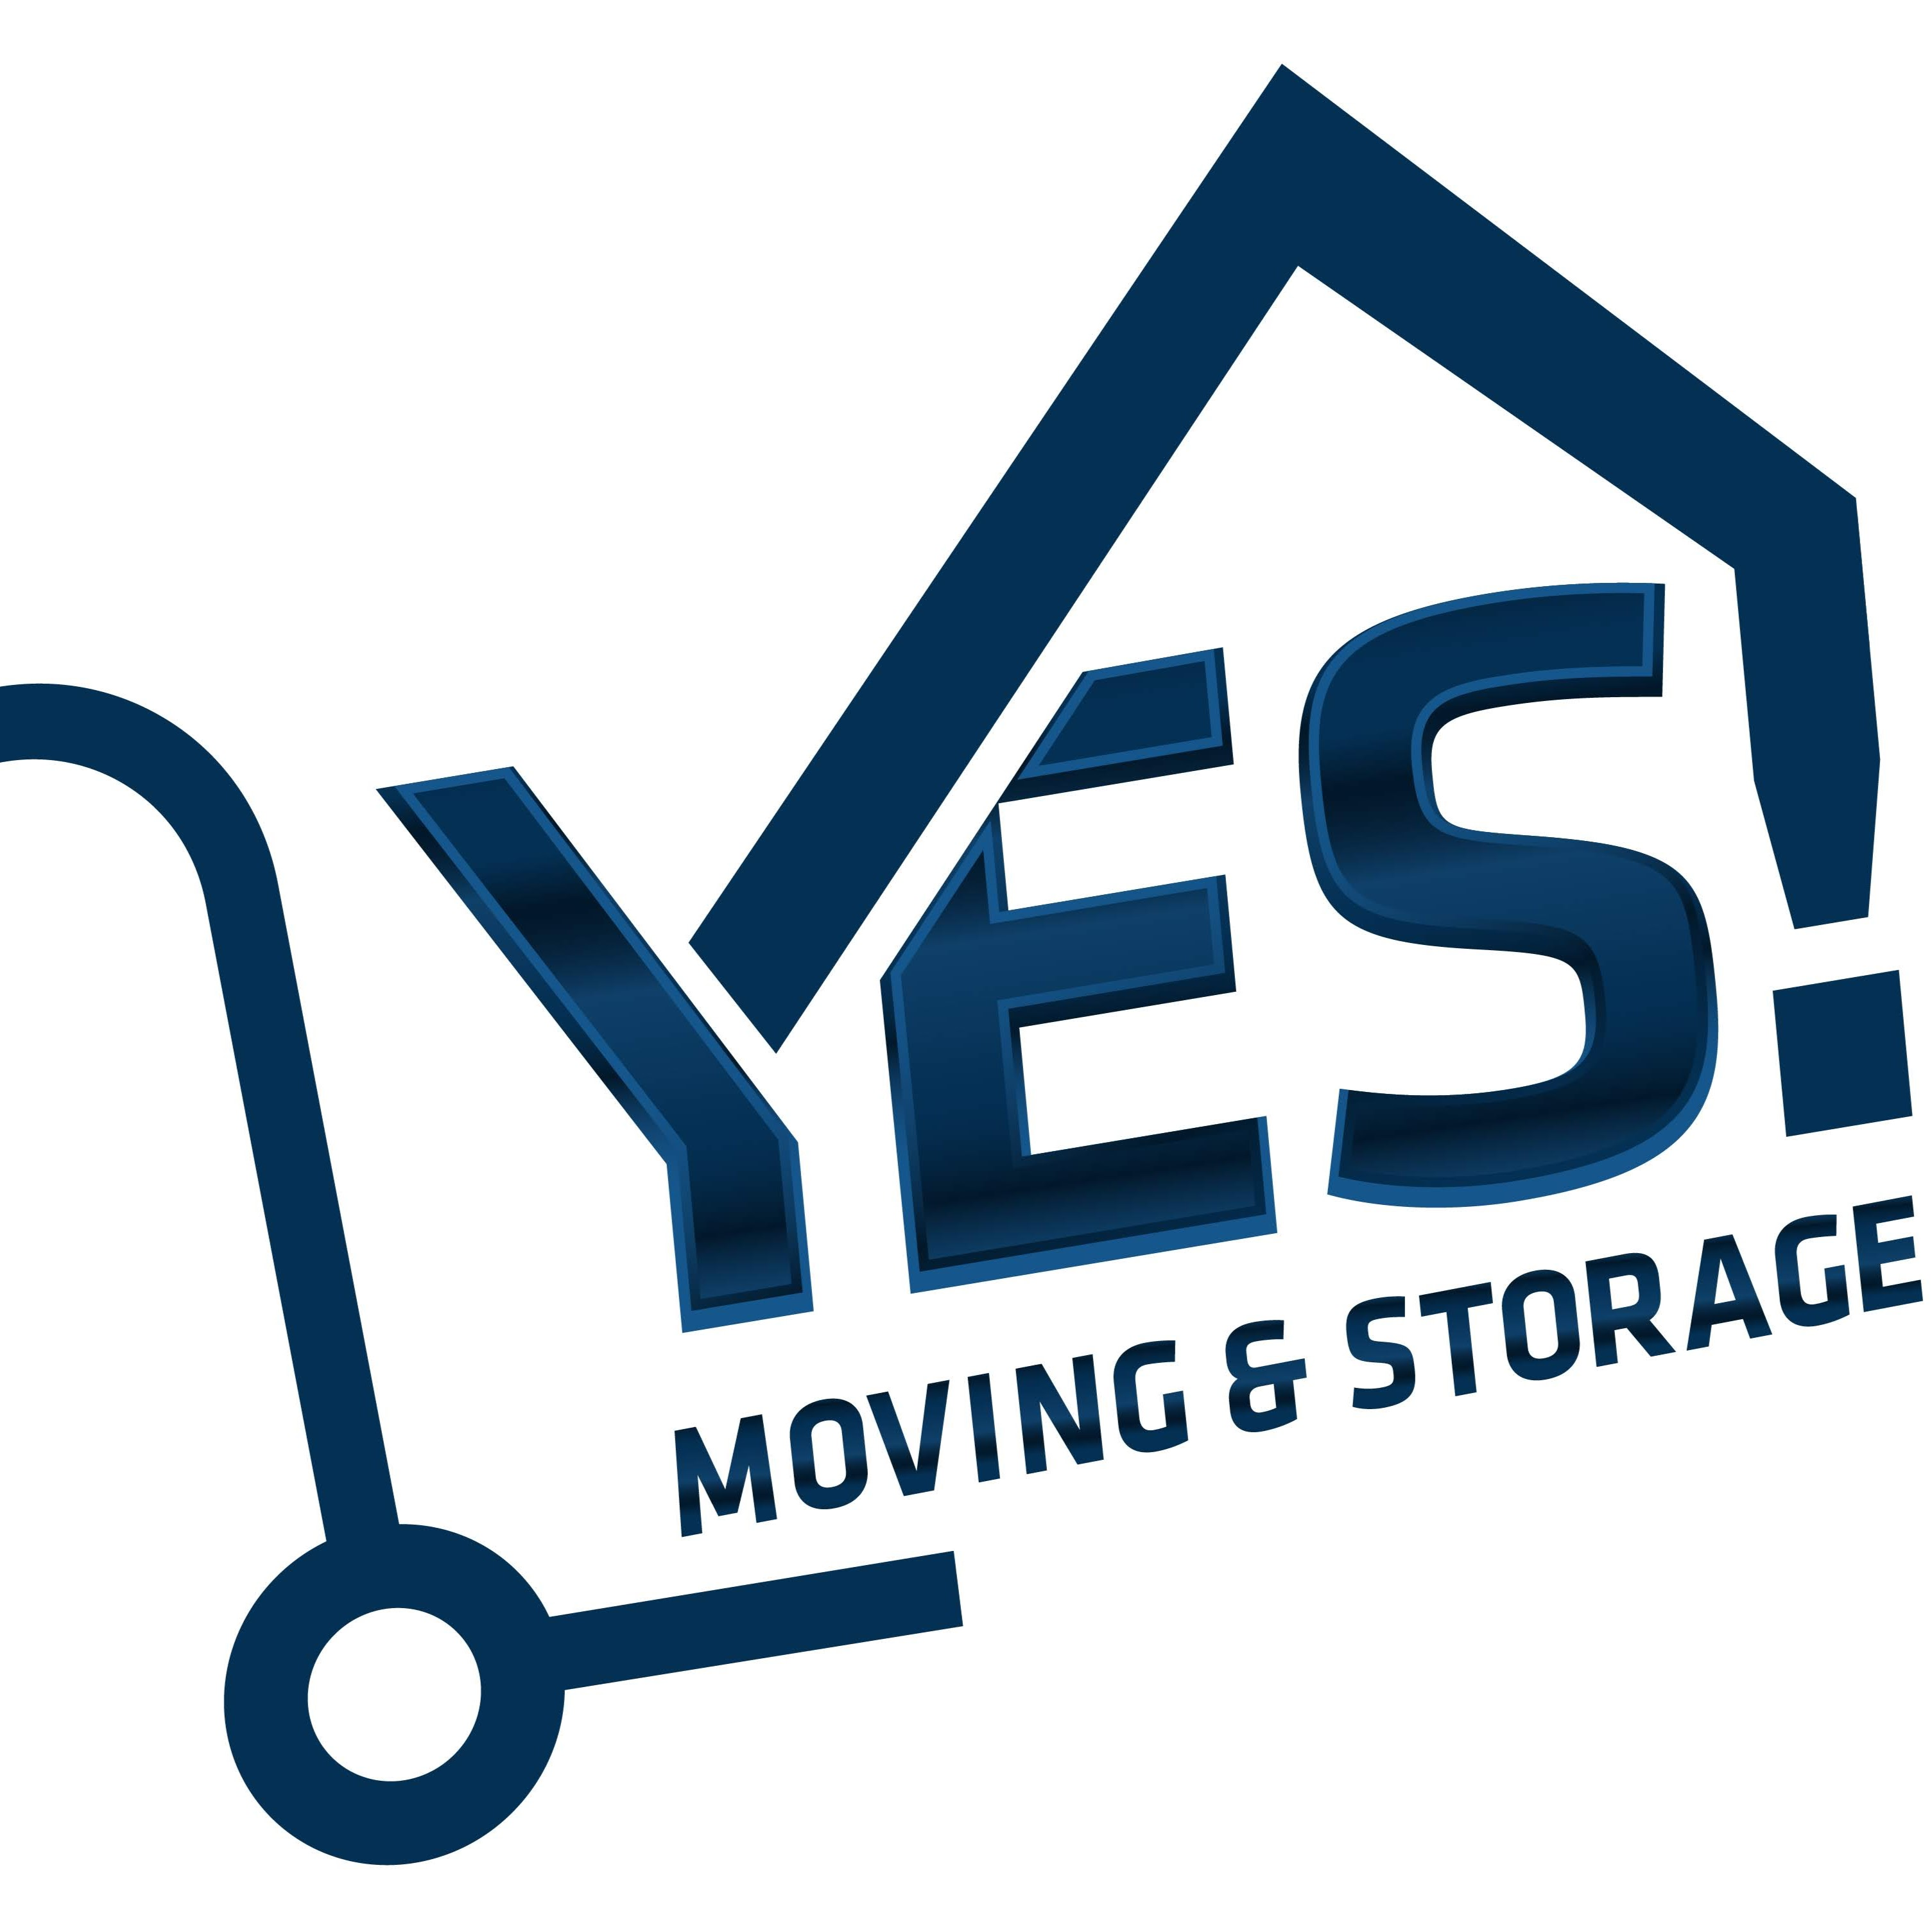 Yes! Moving & Storage